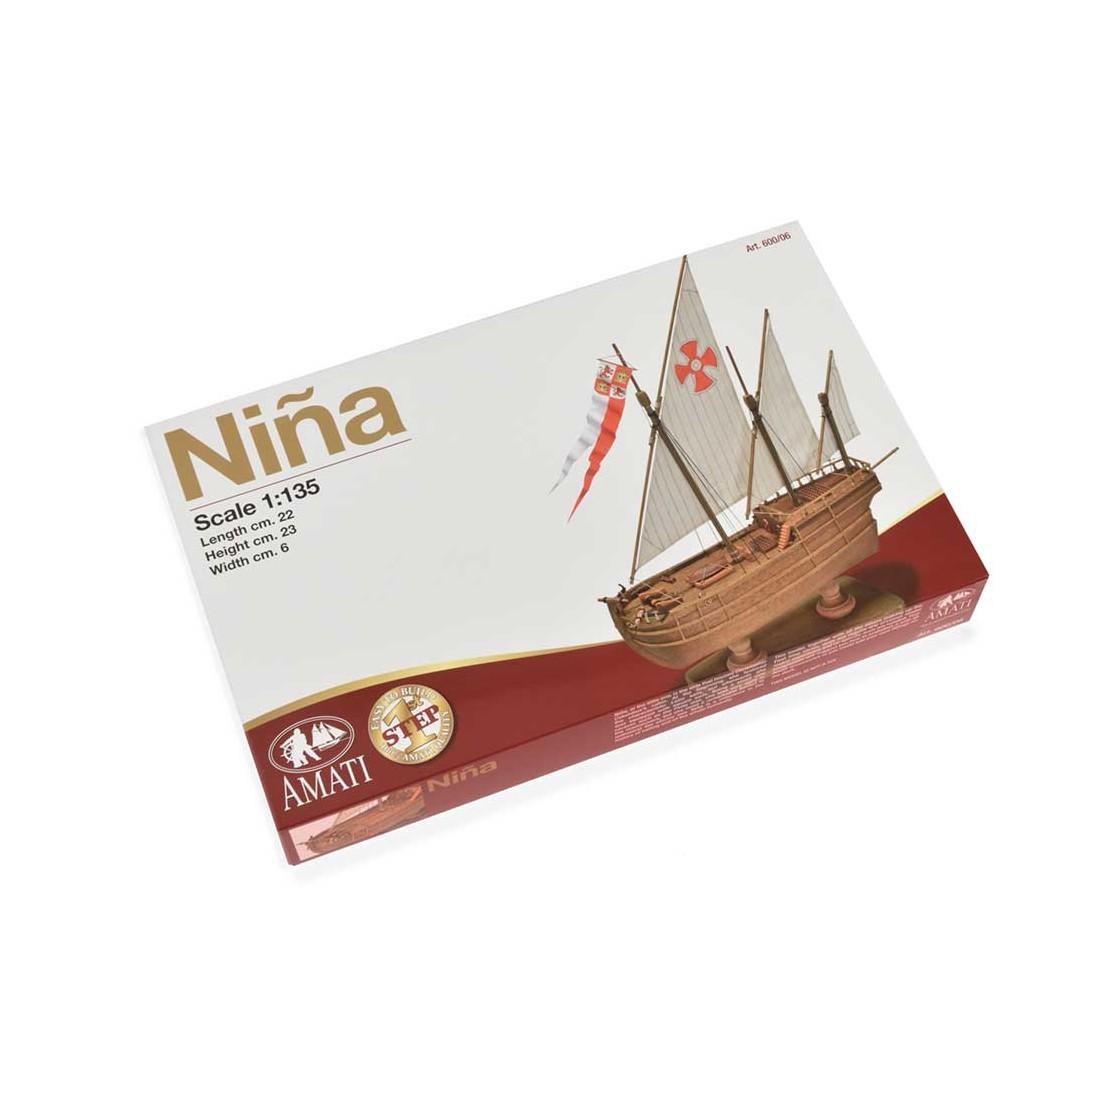 Scatola montaggio Nina - First Step